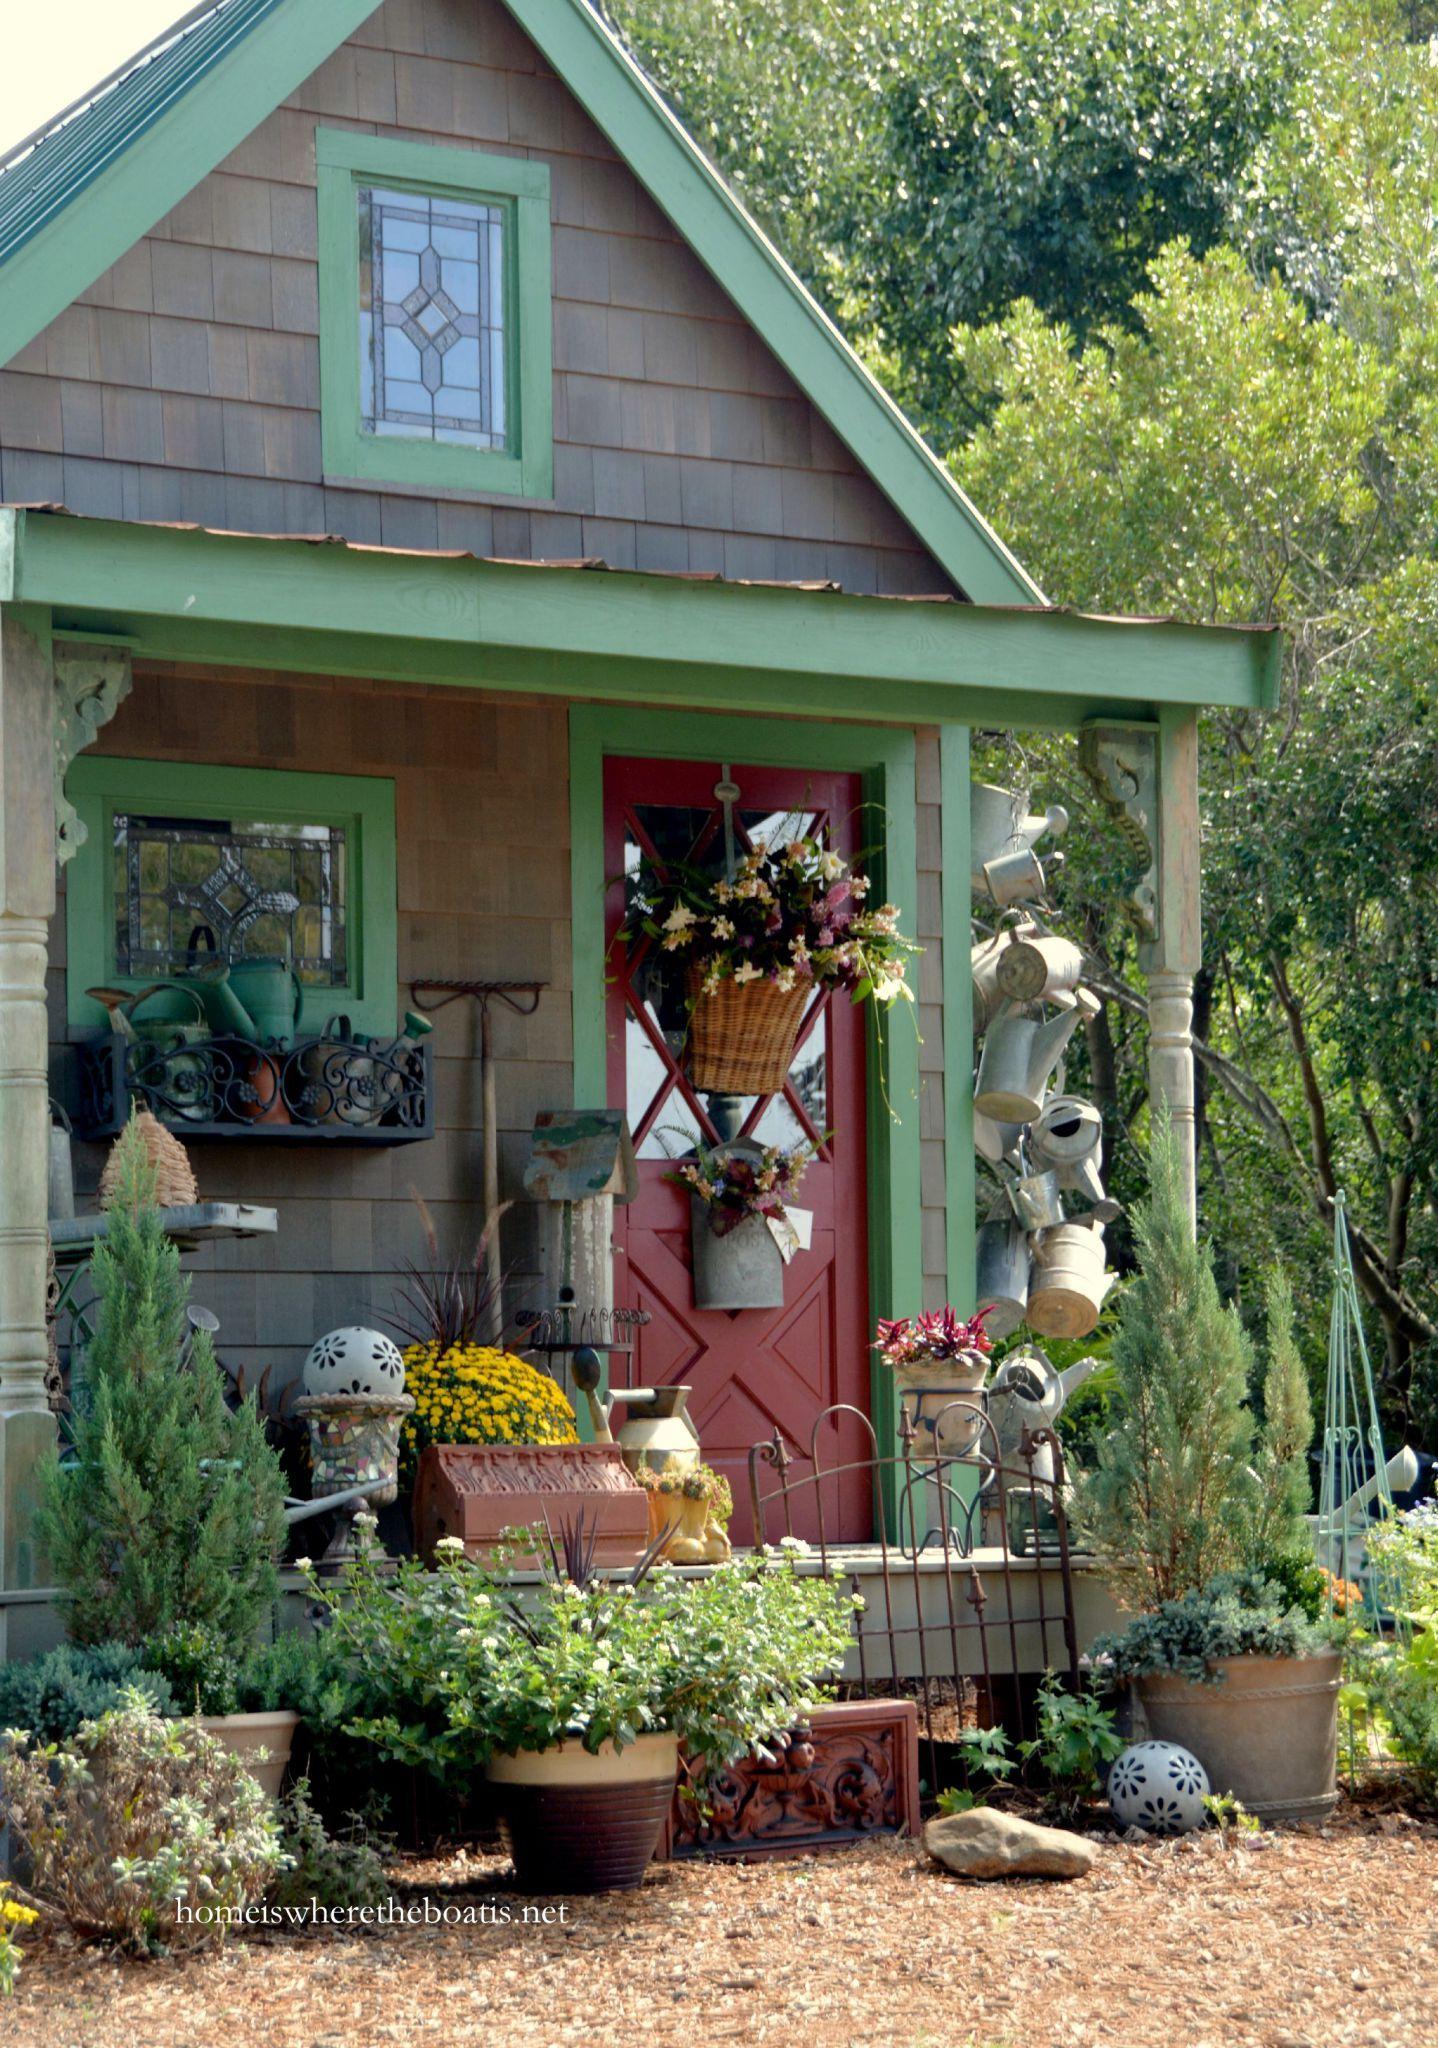 Potting Shed | homeiswheretheboatis.net #garden | Garden | Pinterest ...